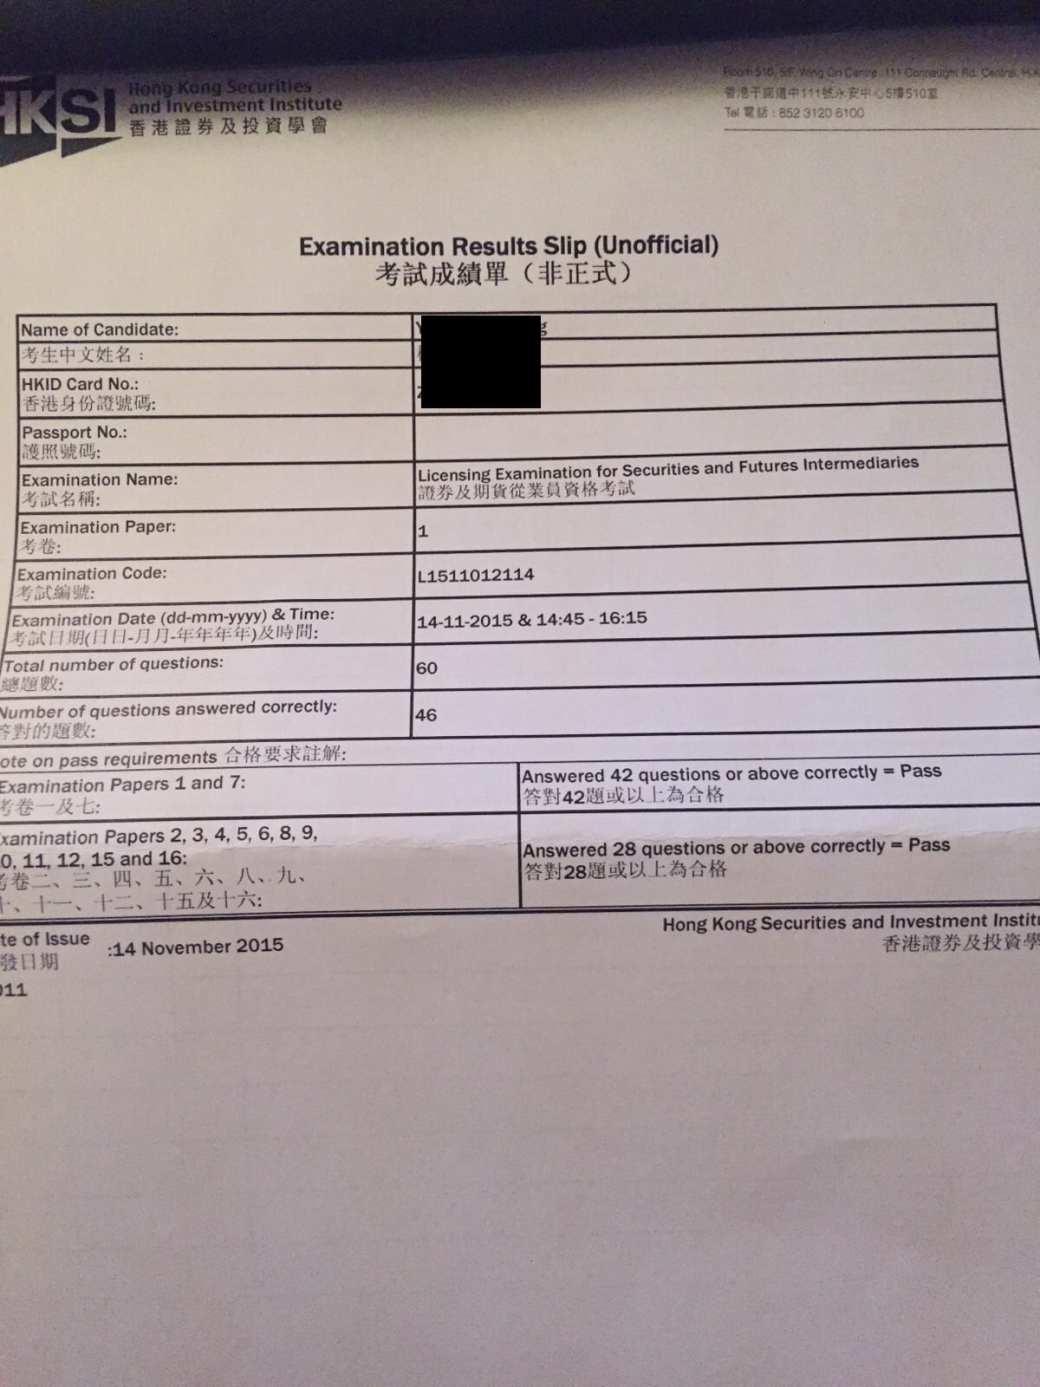 Wanbongyeung 14/11/2015 LE Paper 1 證券期貨從業員資格考試卷一 Pass